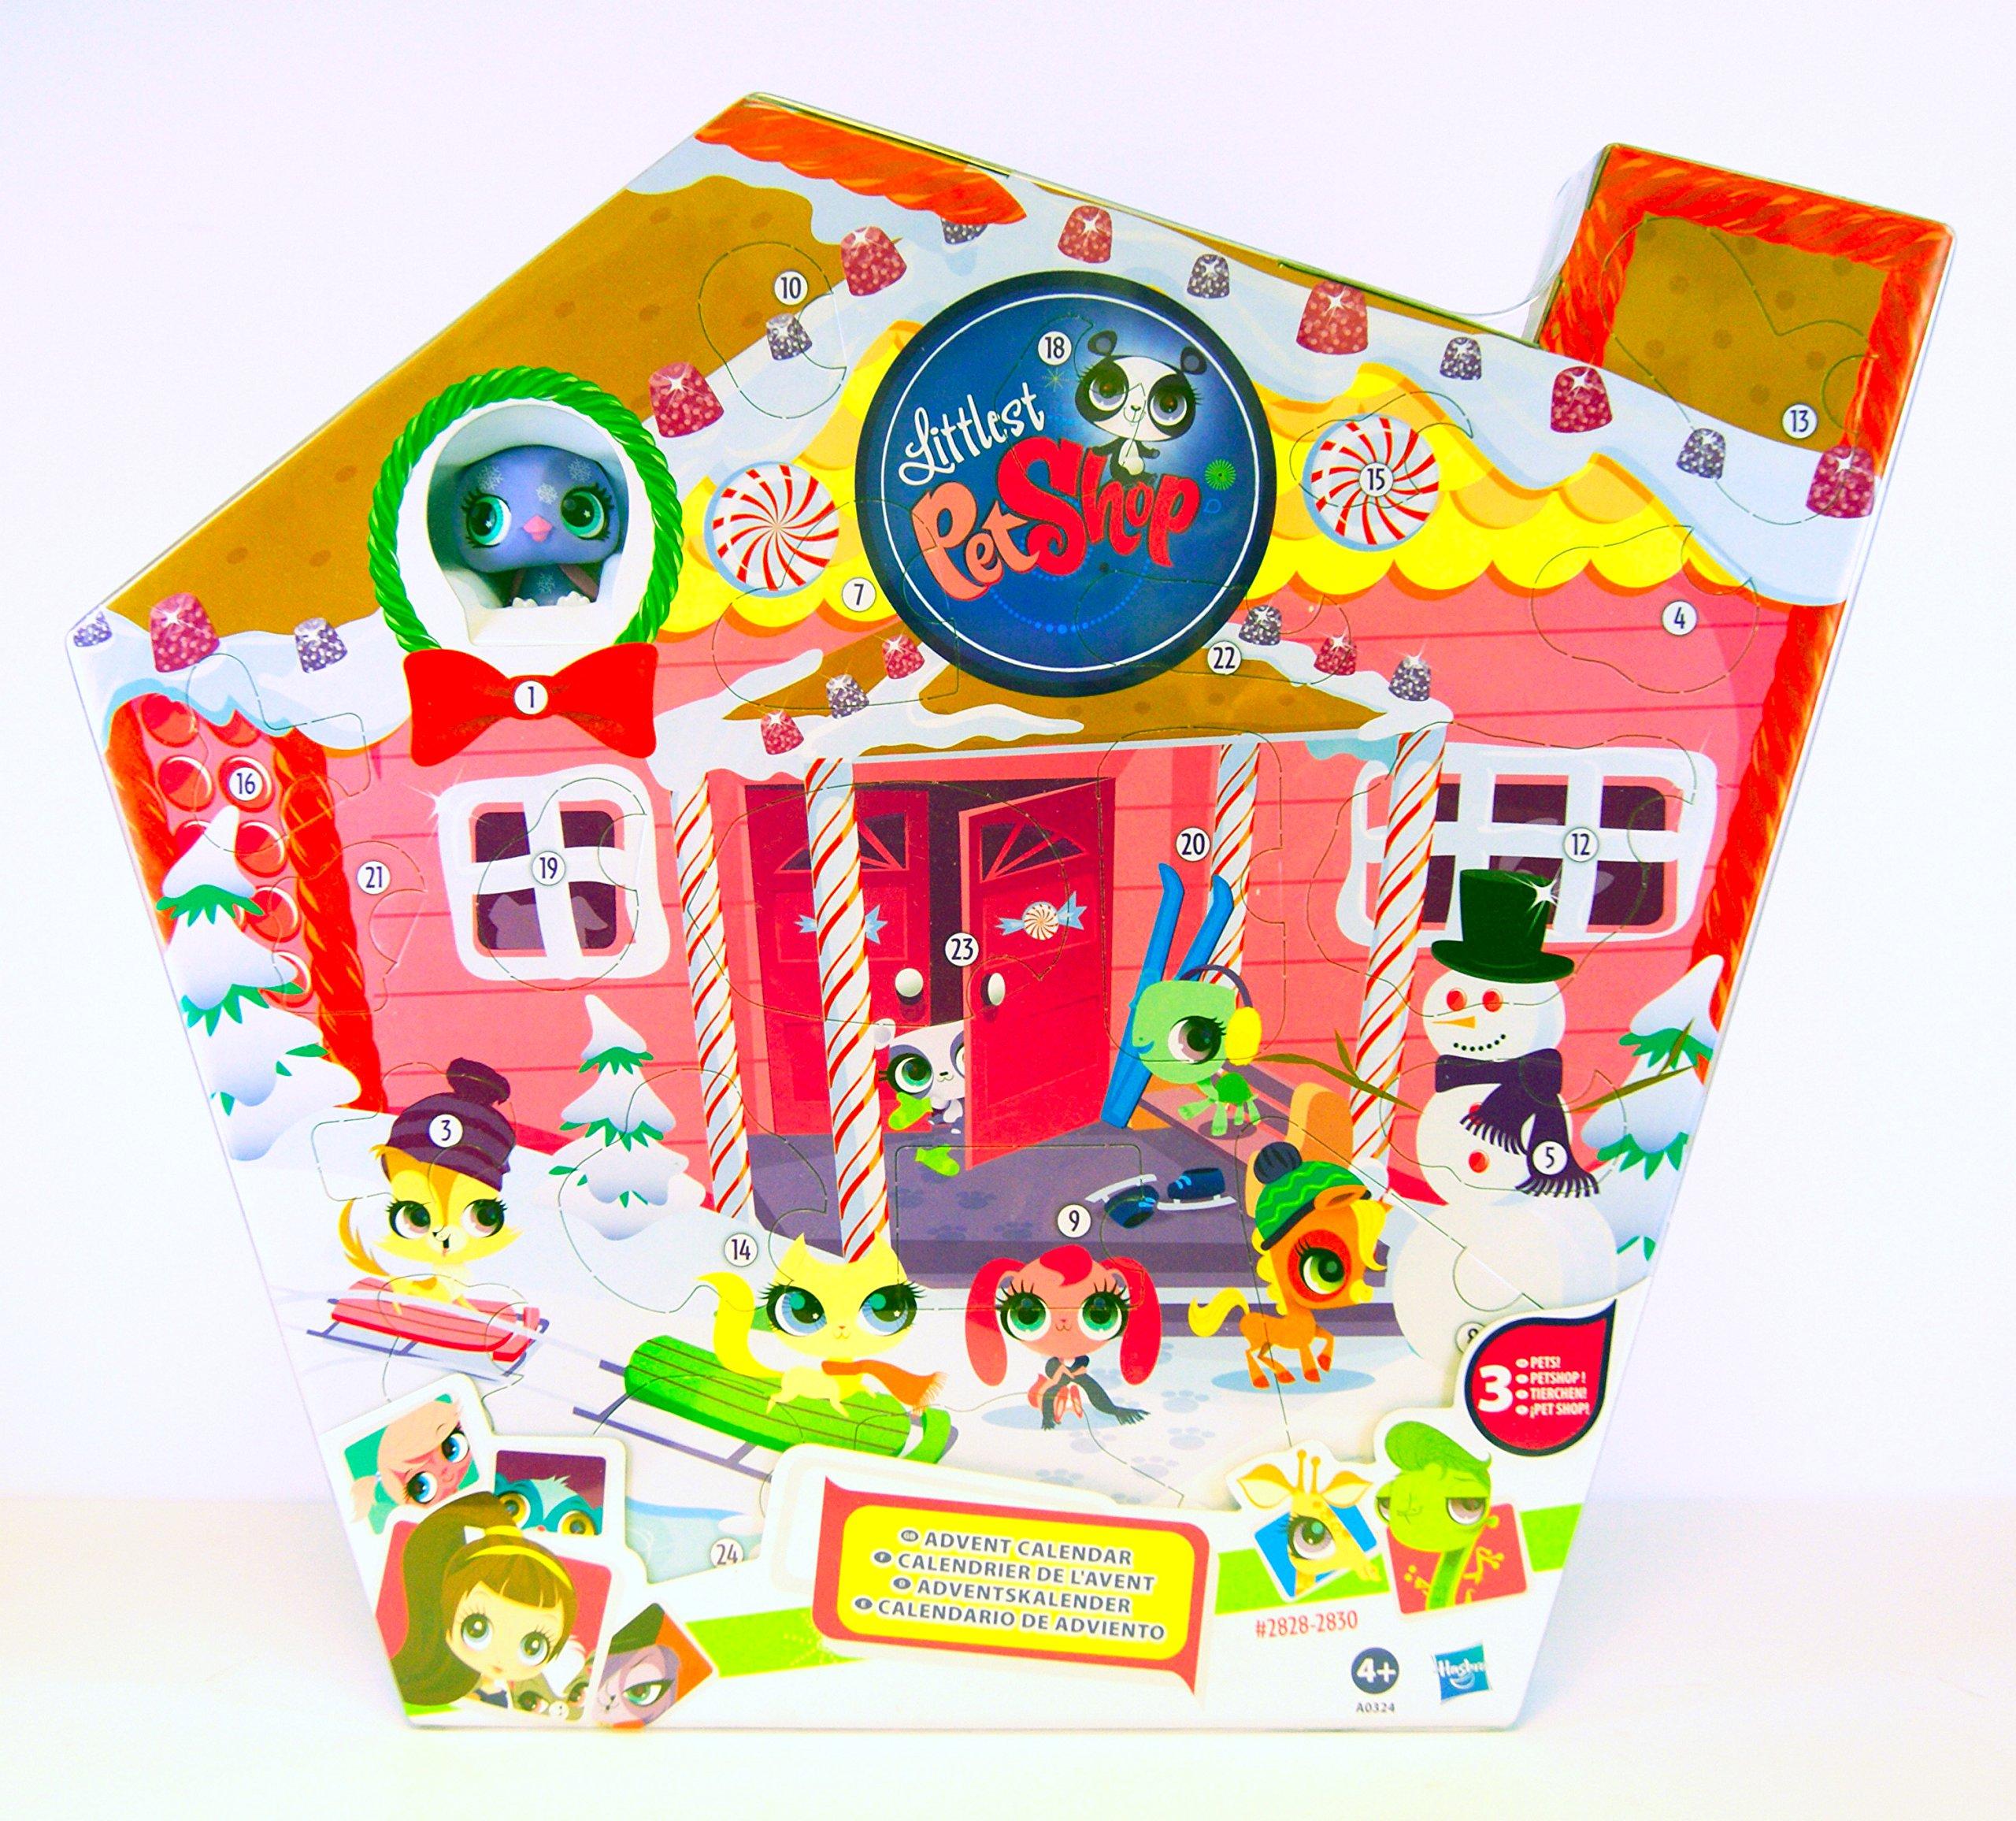 Littlest Pet Shop - Advent Calendar 2012 - 3 Pets incl. #2828 - #2829 - #2830 and a lot of accessories